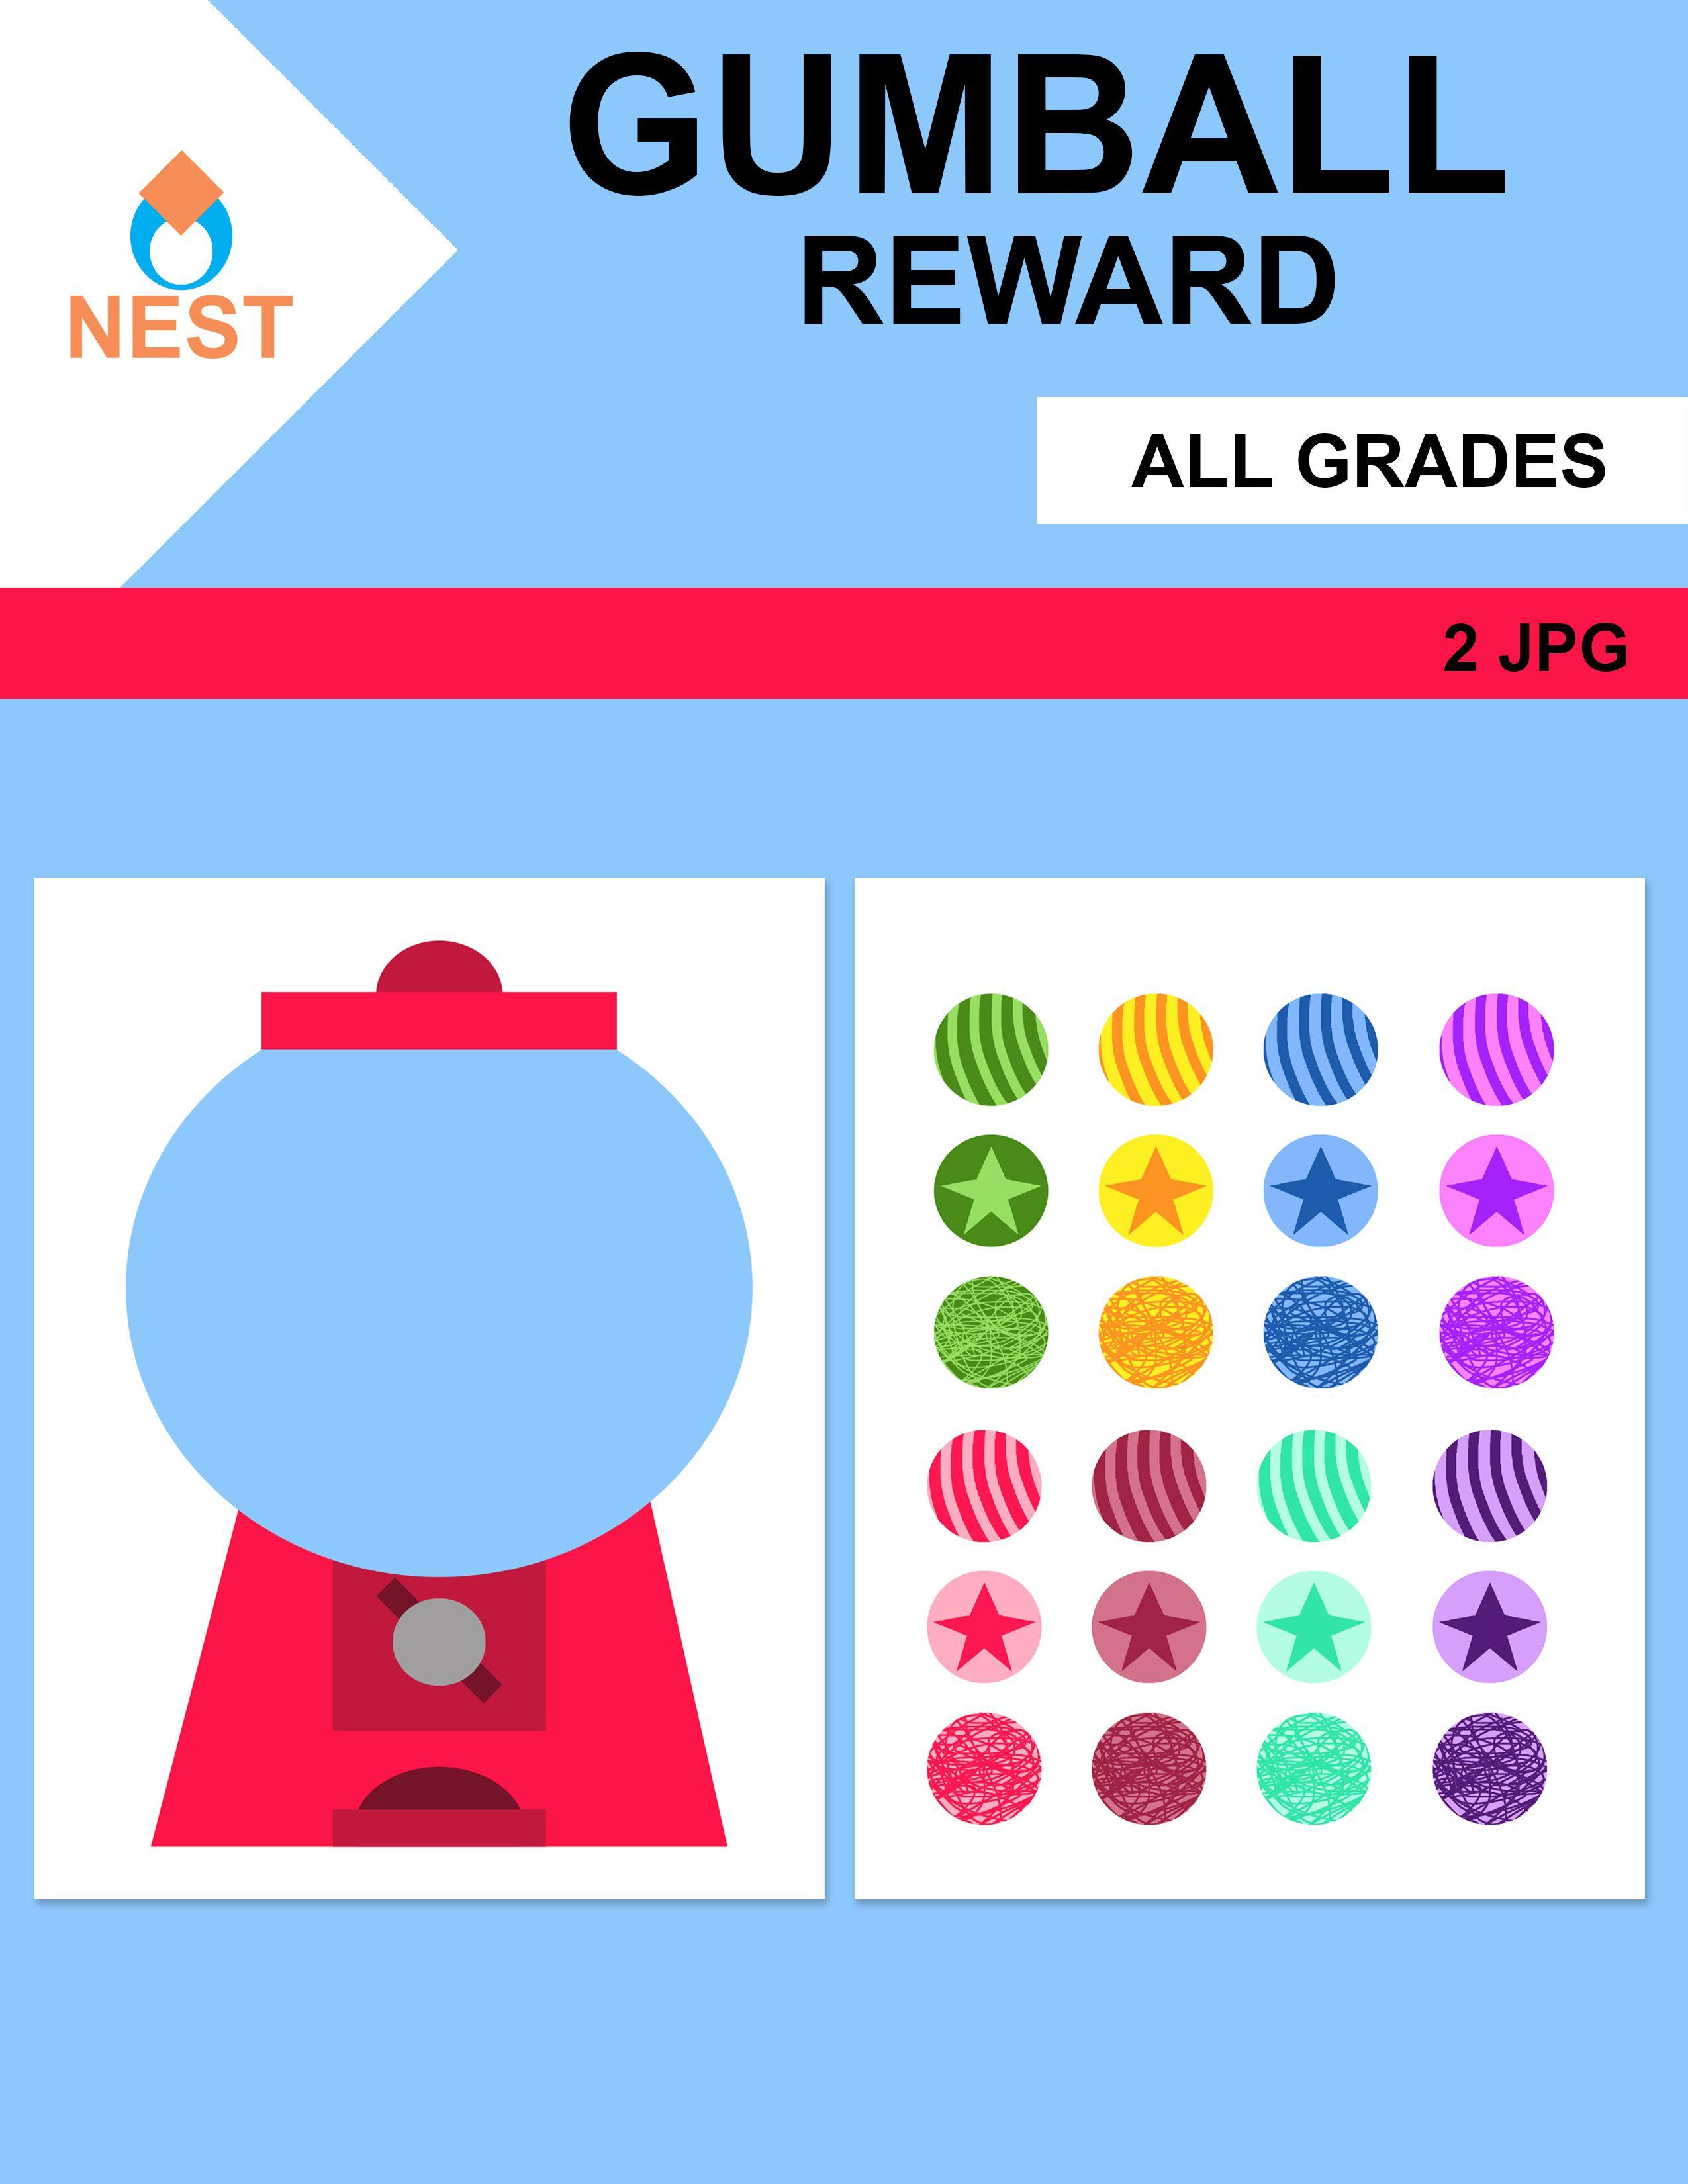 Gumball Reward System In